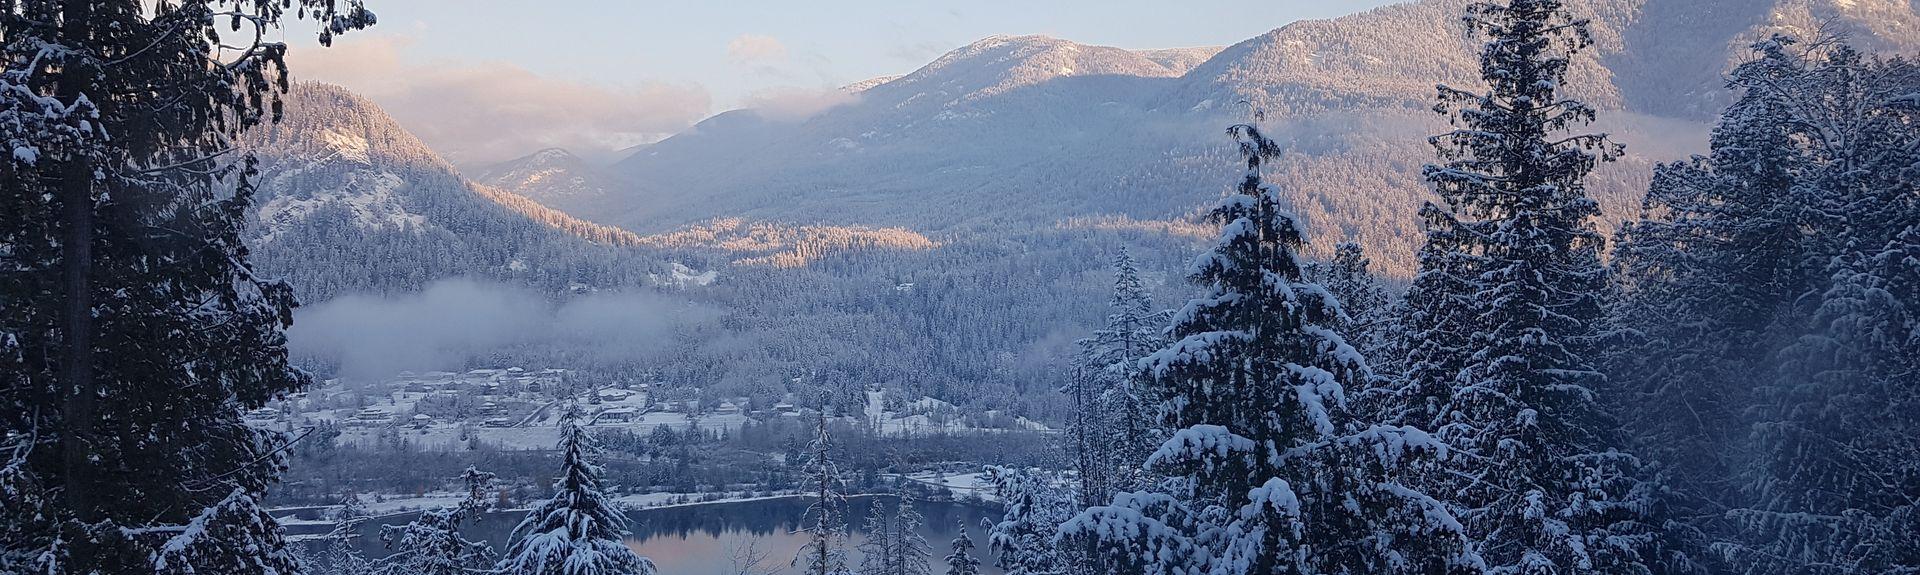 Beasley, BC, Canada